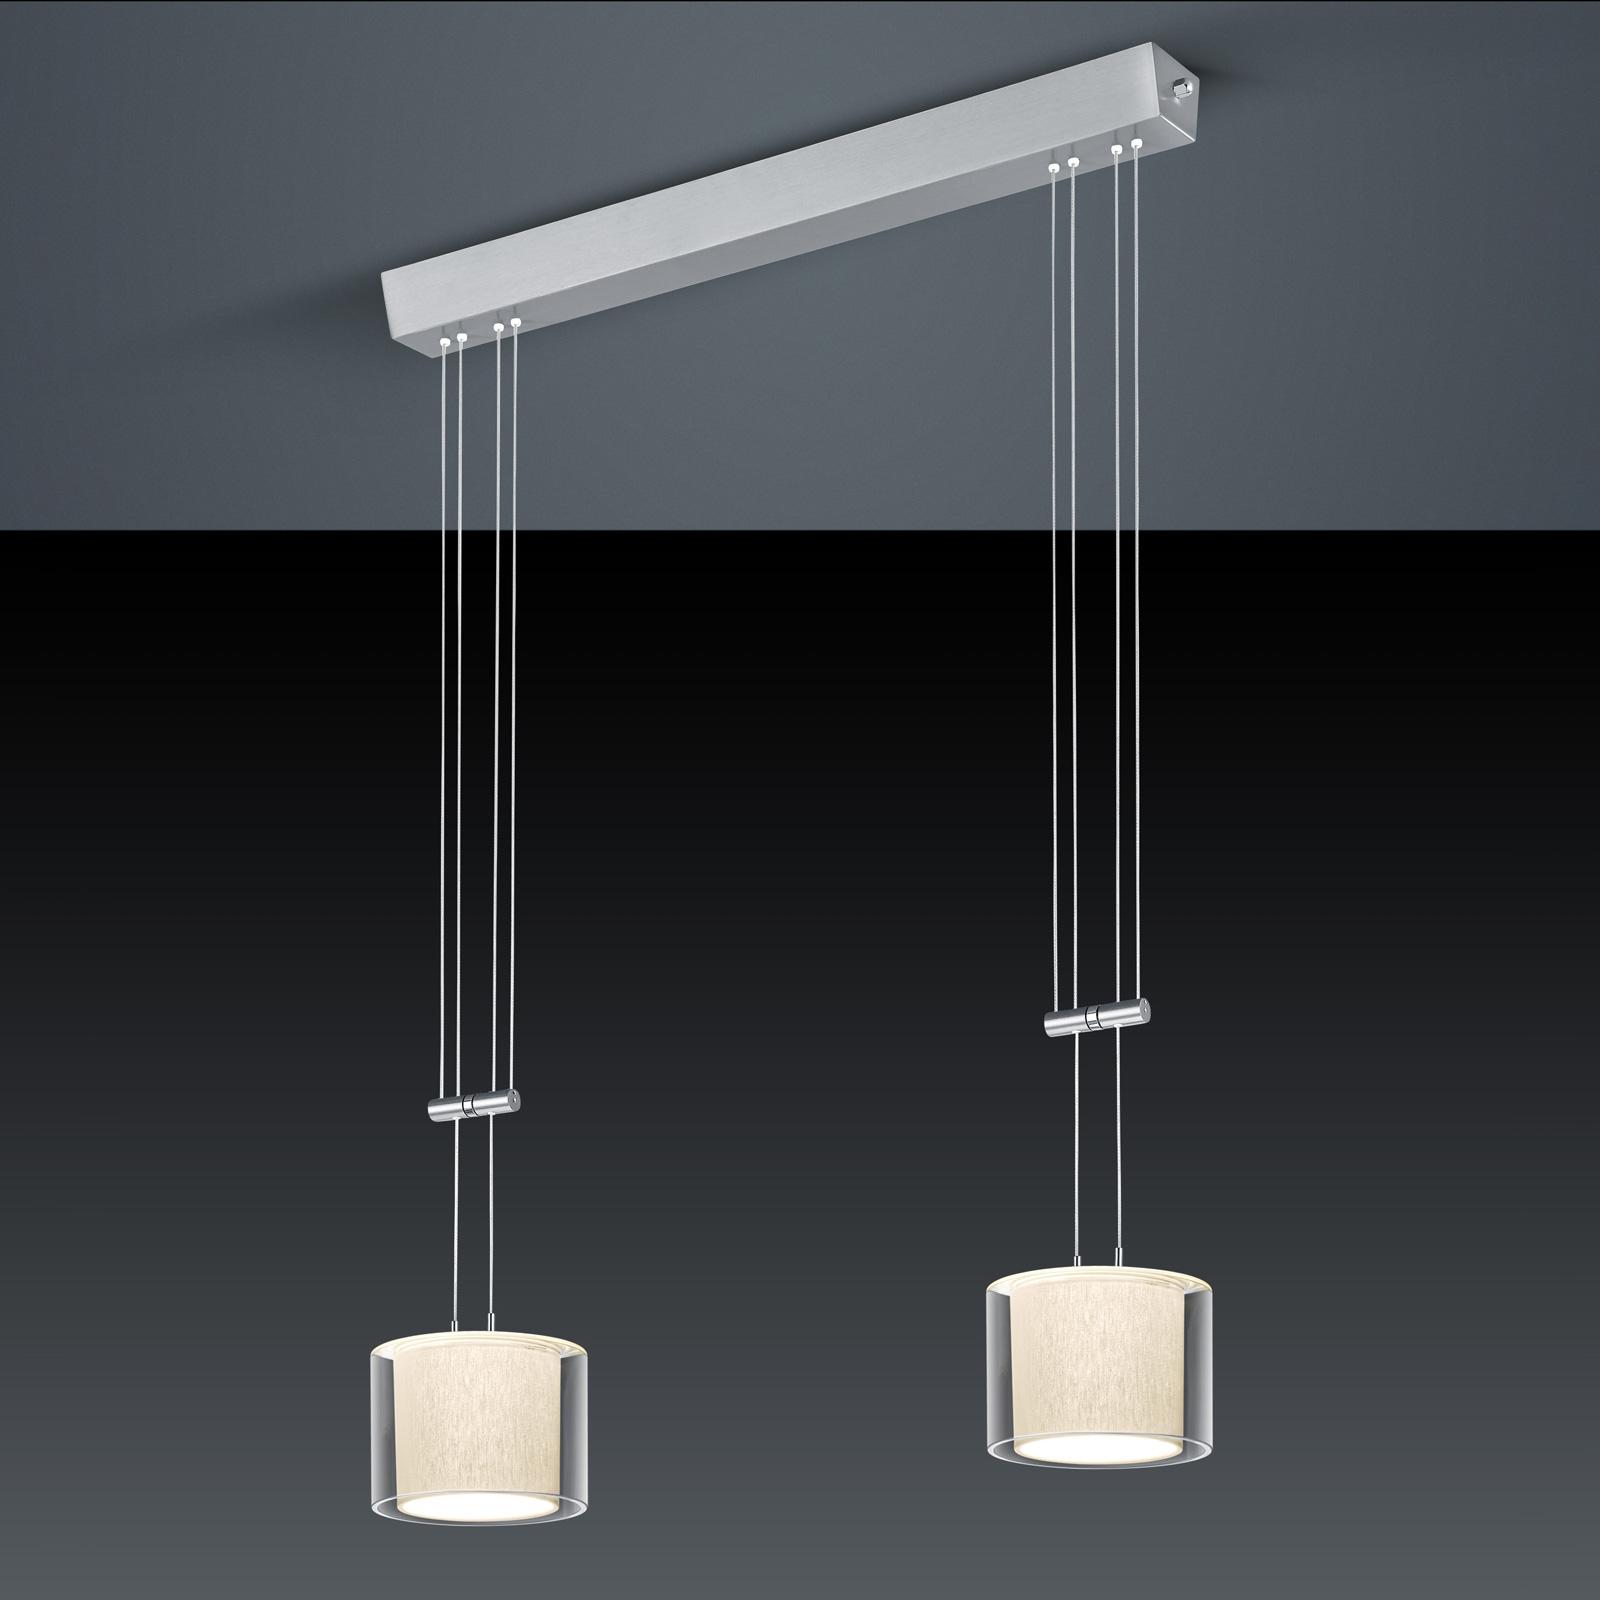 BANKAMP Cecil lampa wisząca LED, 2-punktowa